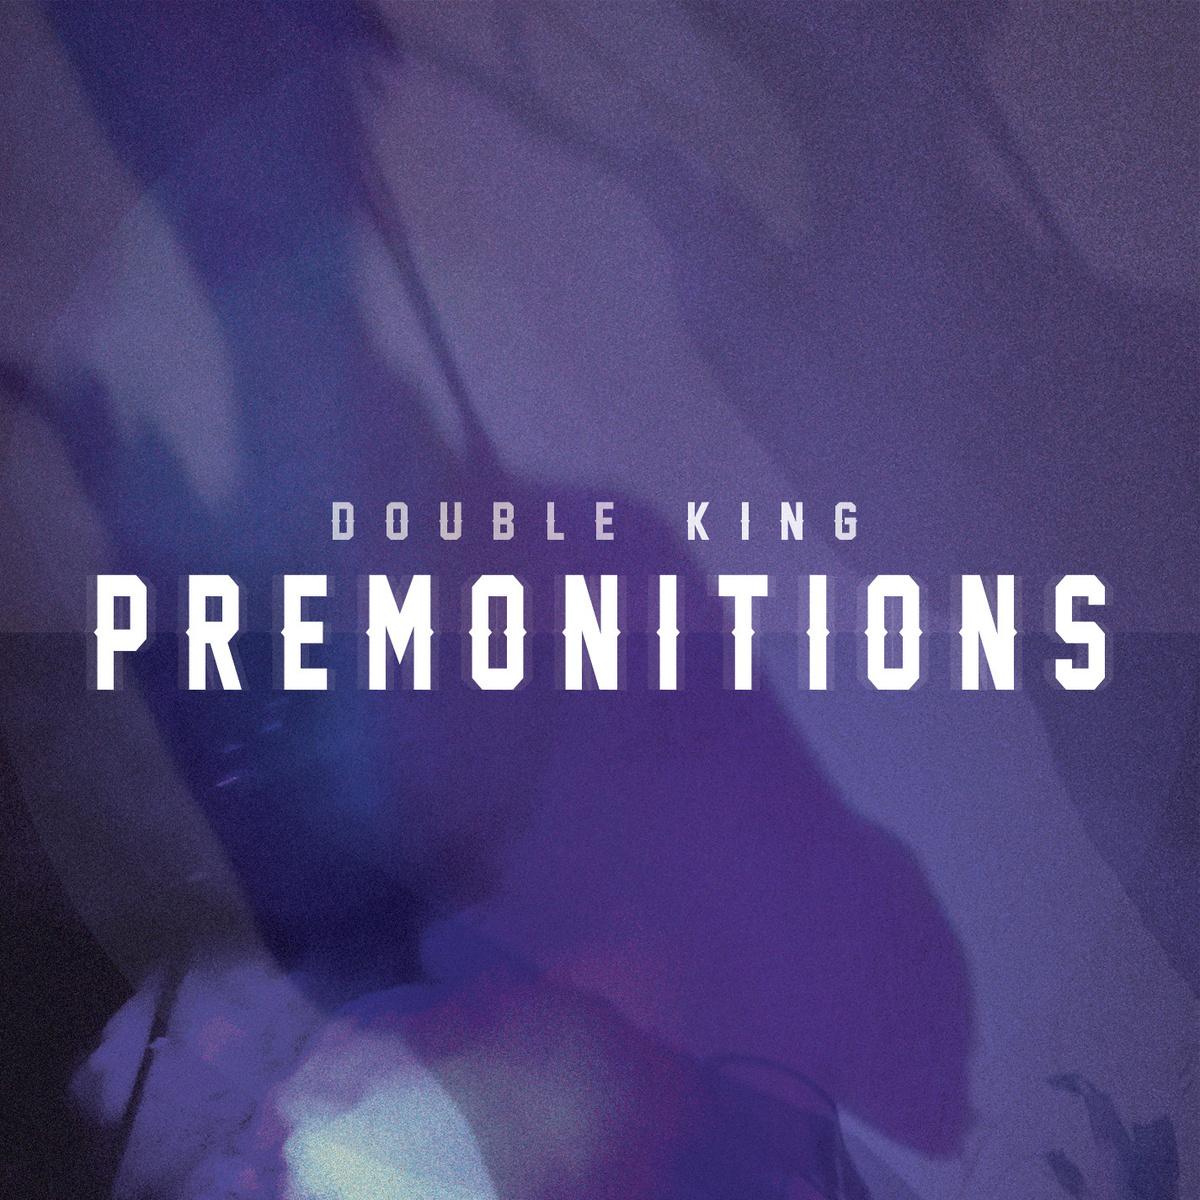 premonitions-cover.jpg